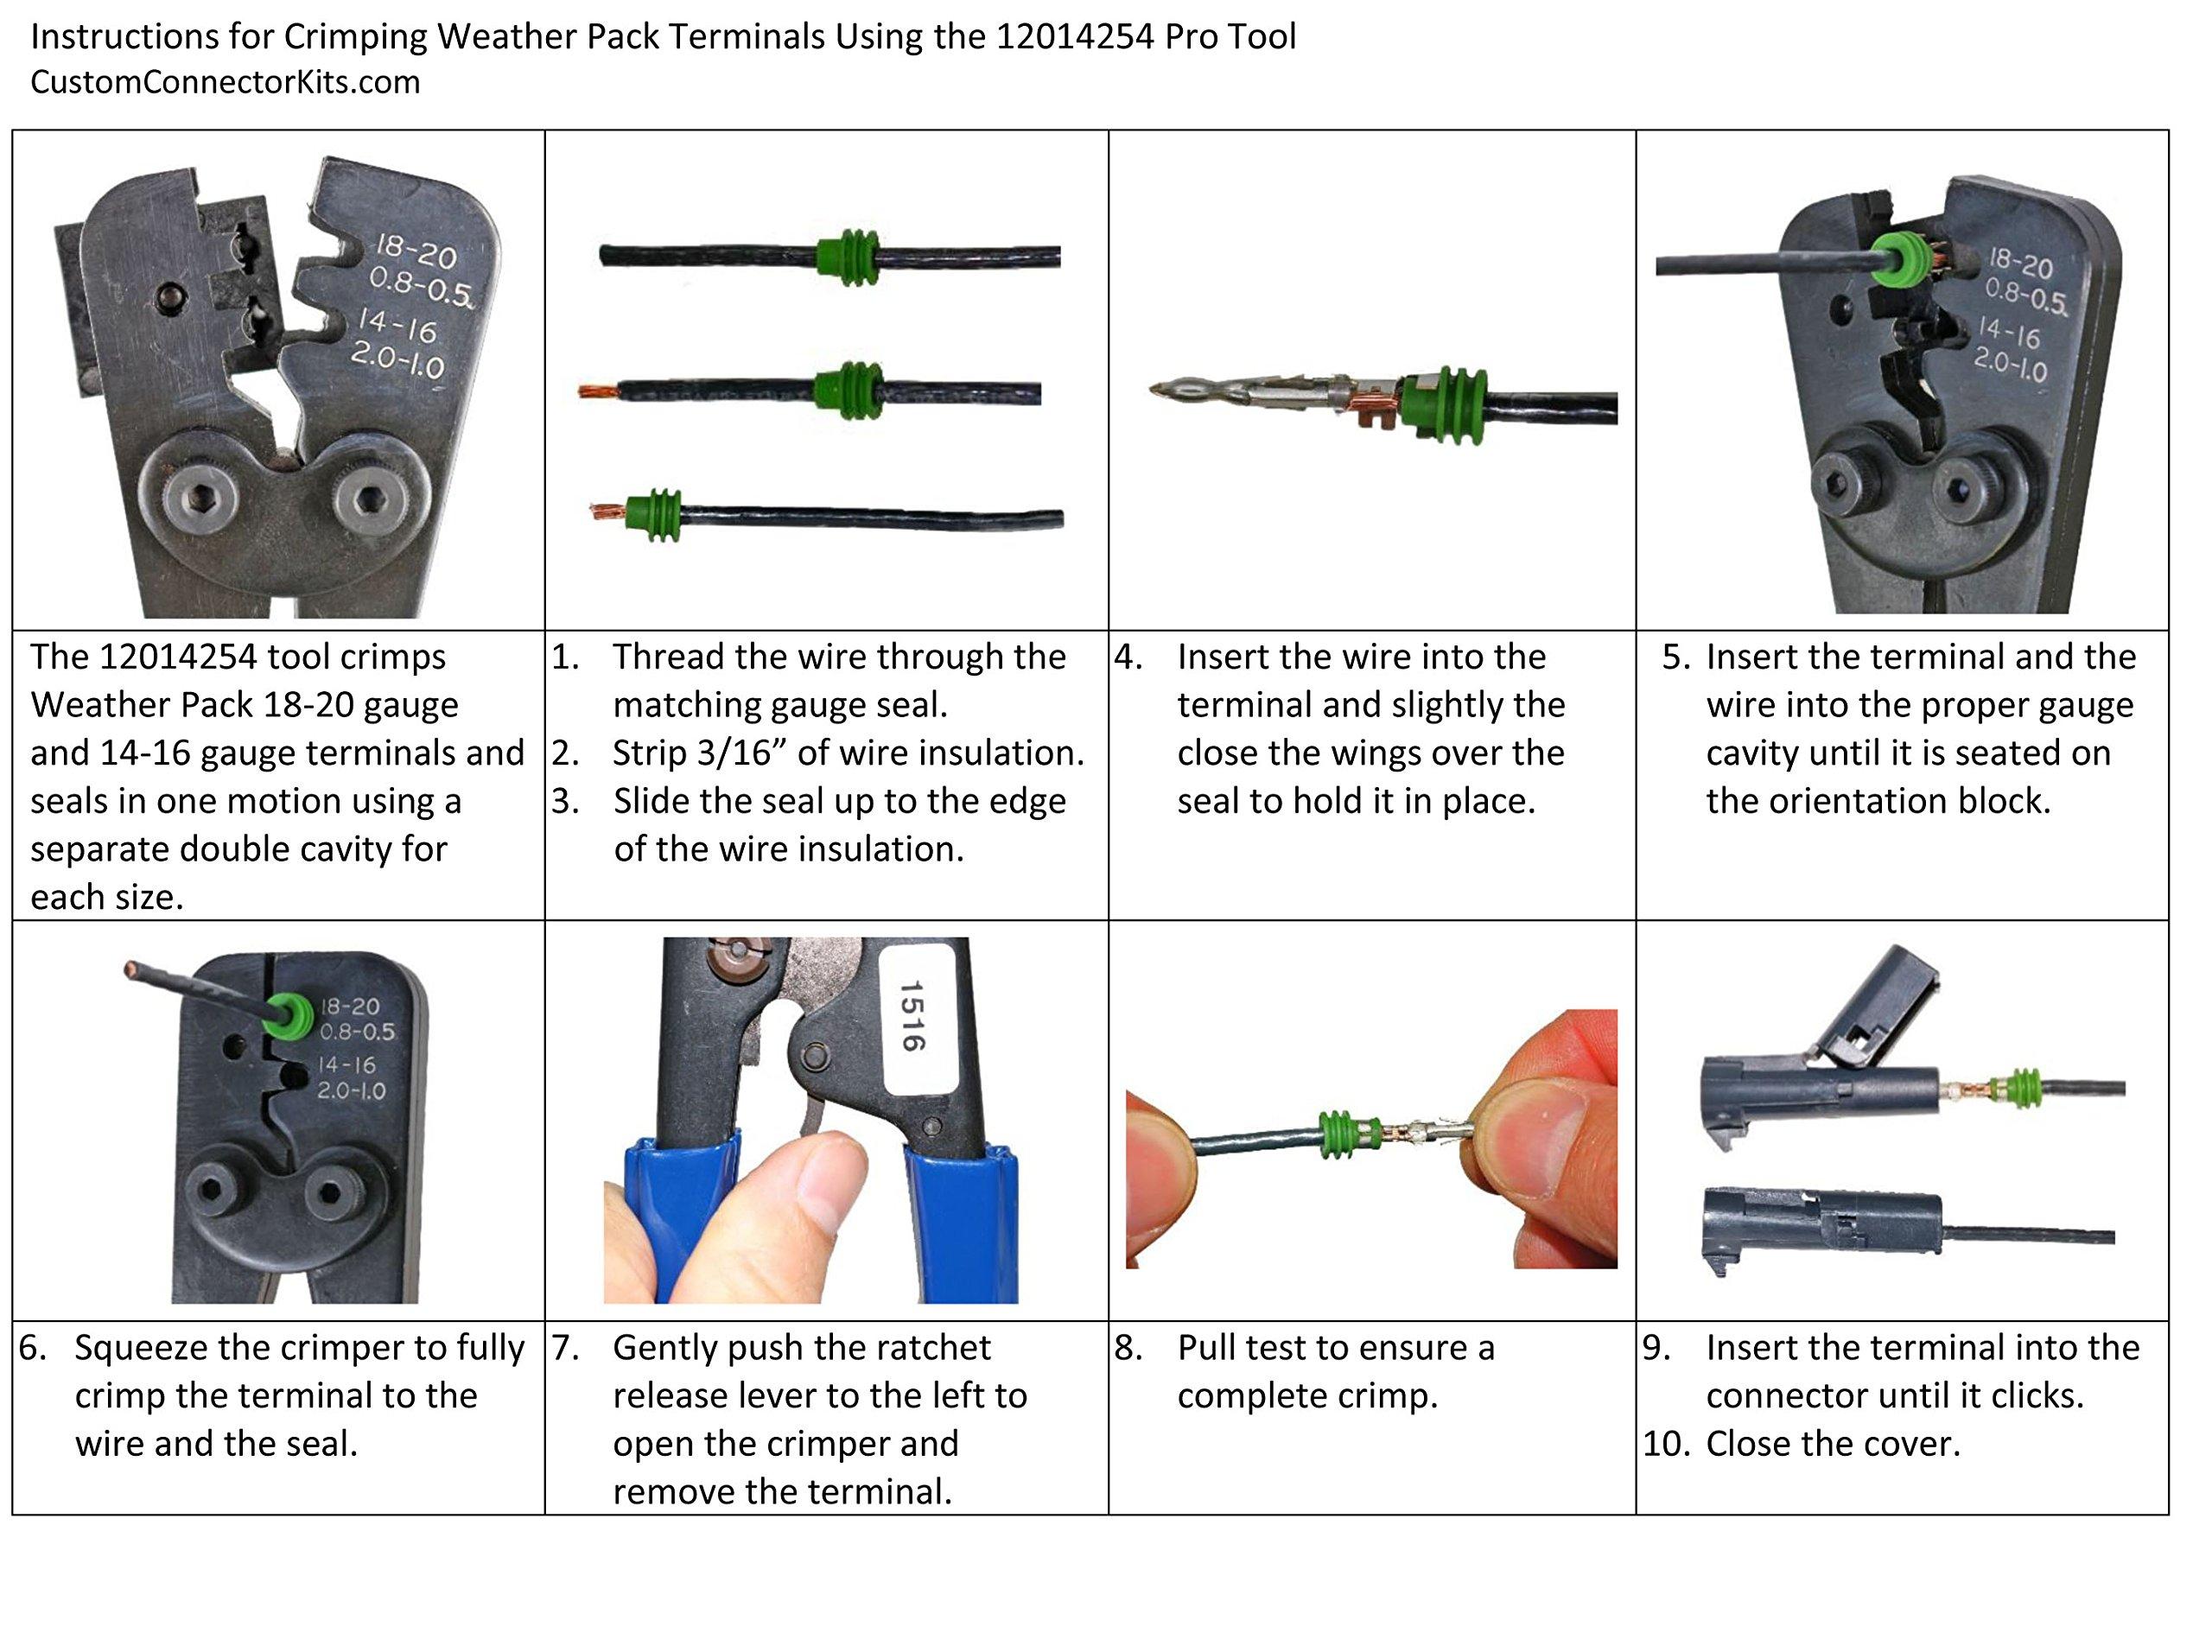 Delphi Weather Pack Connector Kit WP-155: Sealed Weatherproof Automotive Electrical Connectors 20-12 Gauge 155 Piece Kit by DELPHIKITS (Image #3)